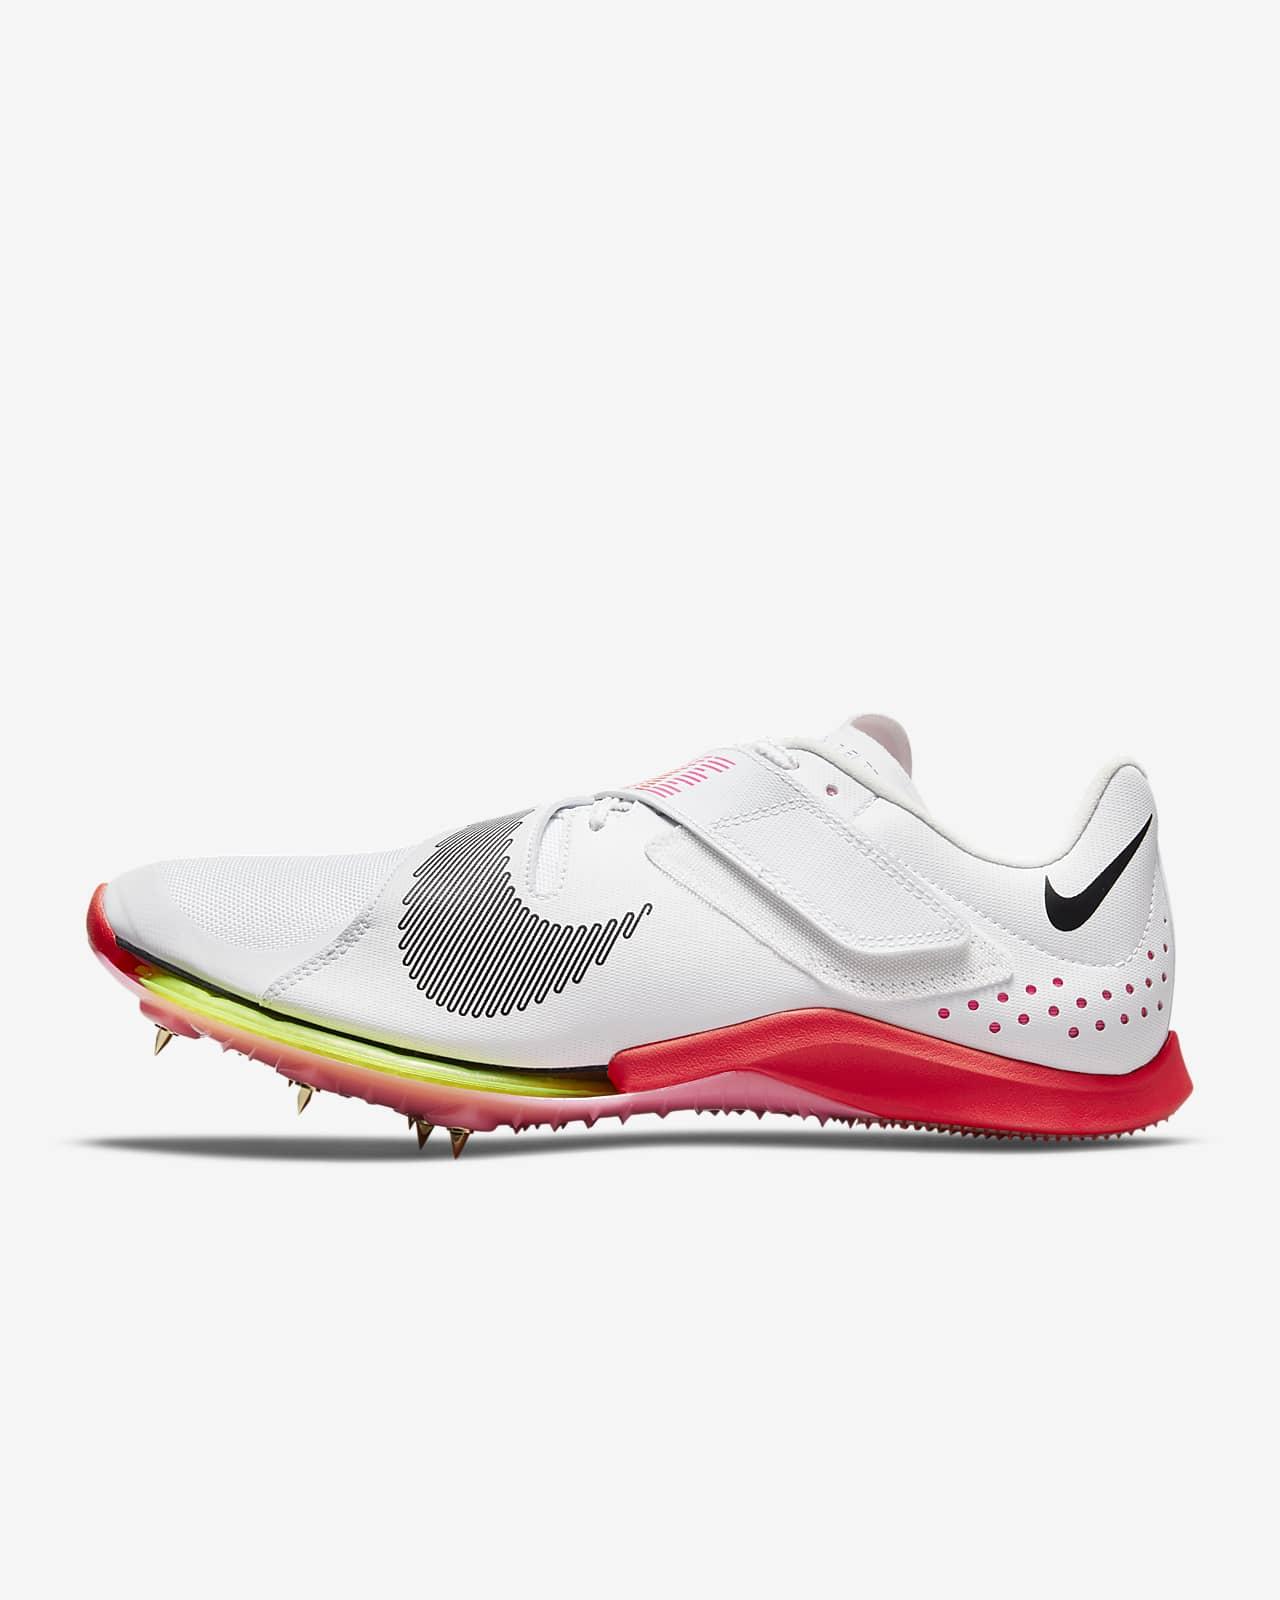 Nike Air Zoom Long Jump Elite Track & Field Shoe